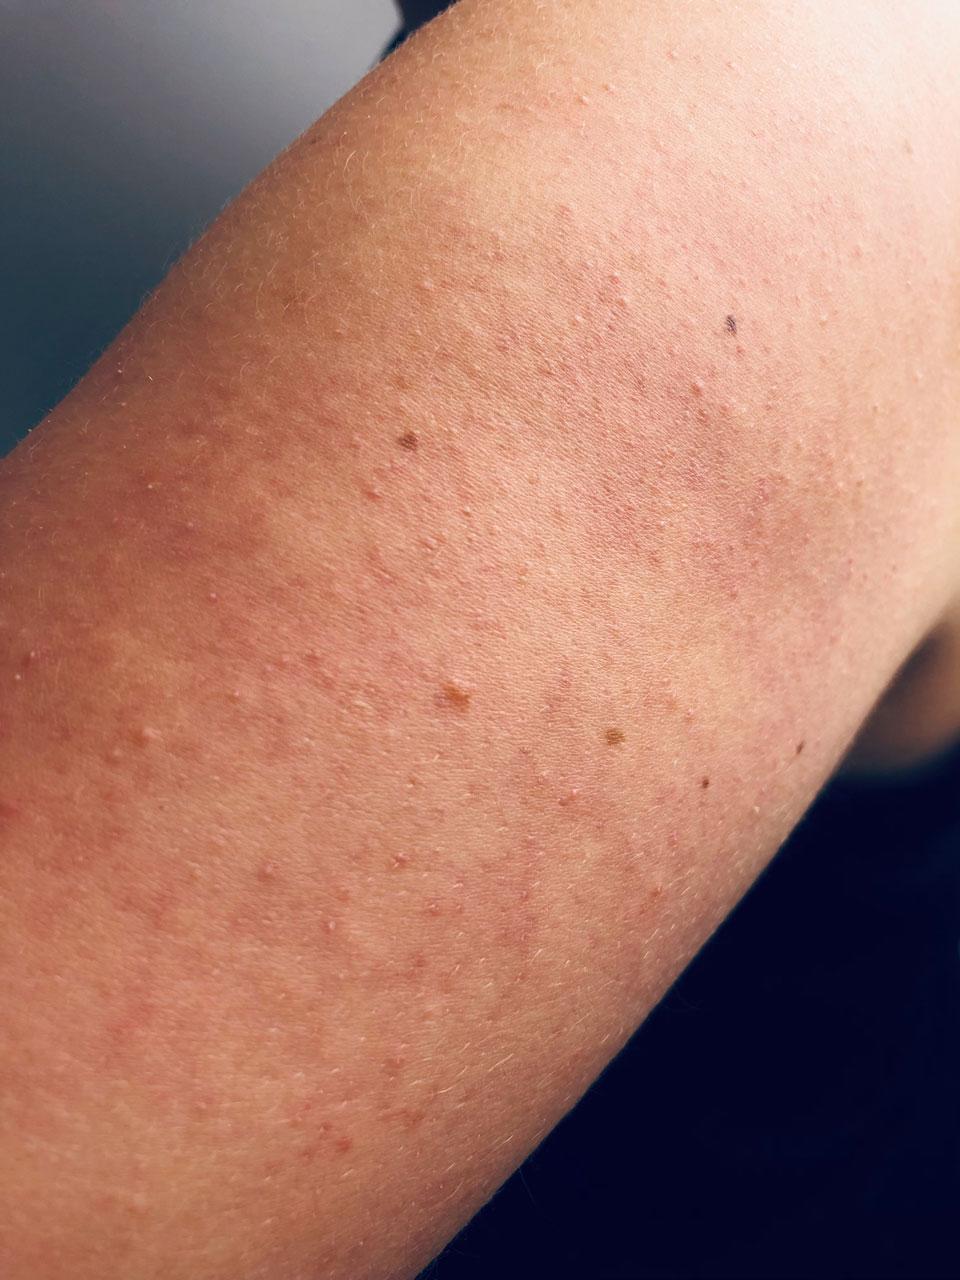 Reibeisenhaut, Keratosis Pilaris, Verhörnungsstörung, Pickel an den Oberarmen, Beauty Tipps, Hautpflege, ElisaZunder Blogazine,